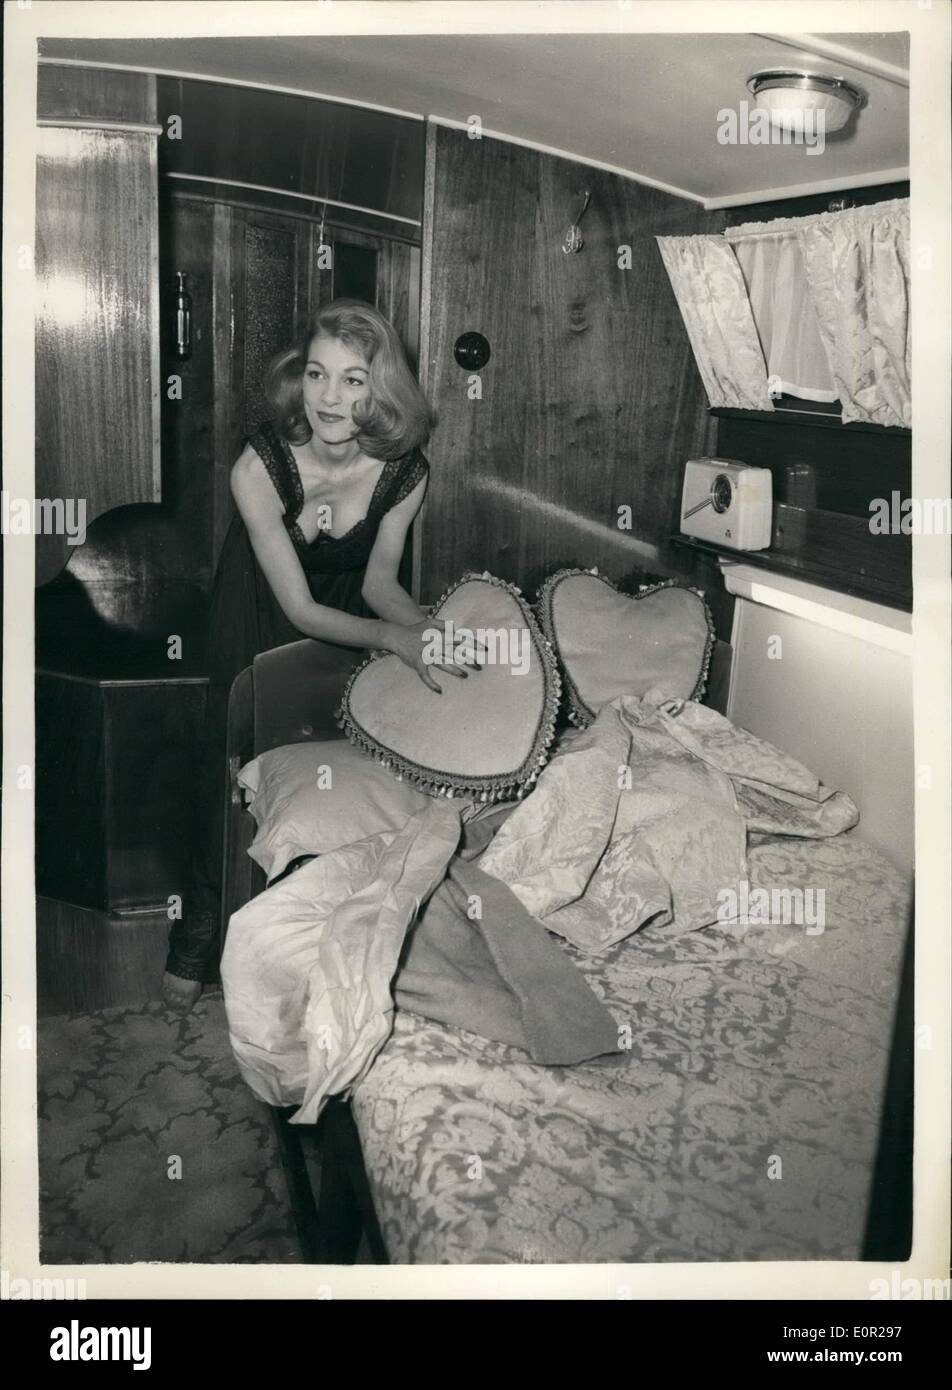 Dec. 12, 1957 - Preparing for the national boat show. The ''Wedding Belie'' motor cruiser for Honeymooners: Preparations Stock Photo